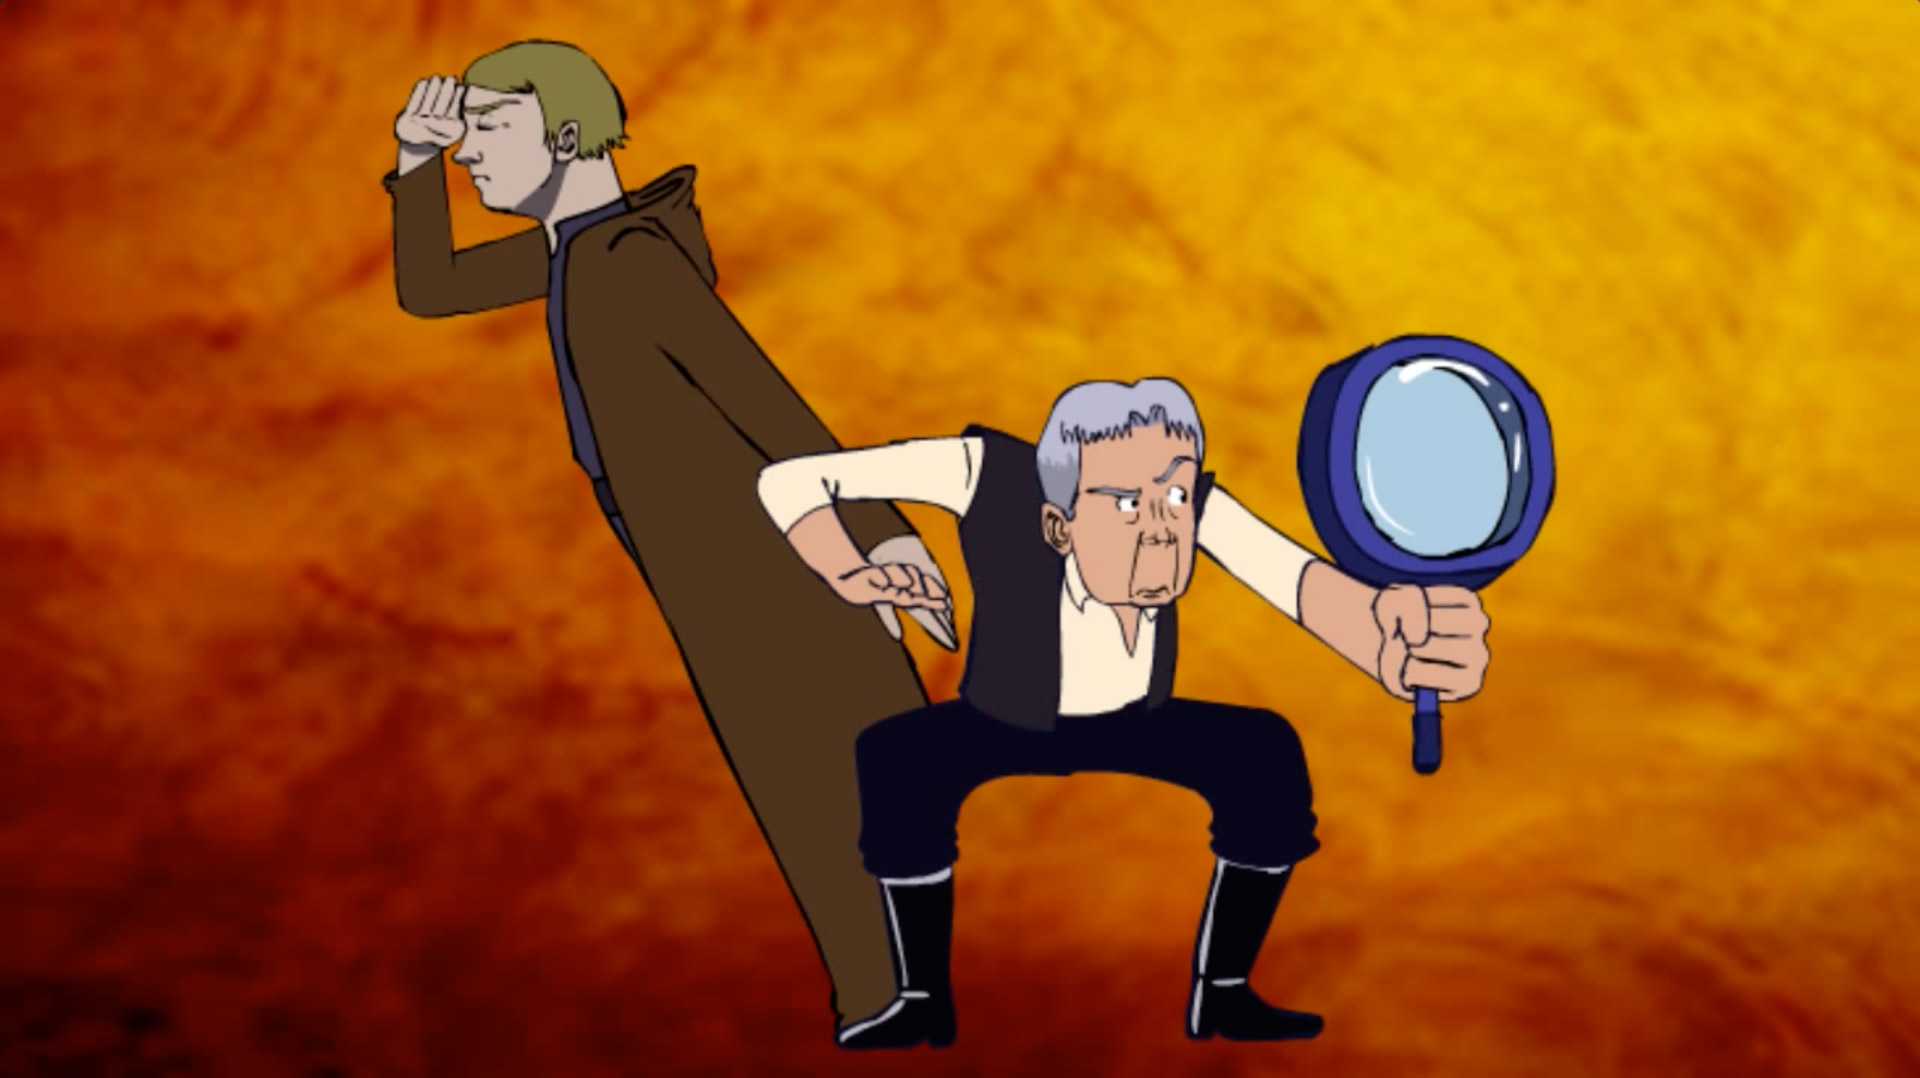 patton-oswalts-star-wars-fillbuster-gets-animated-15.jpg